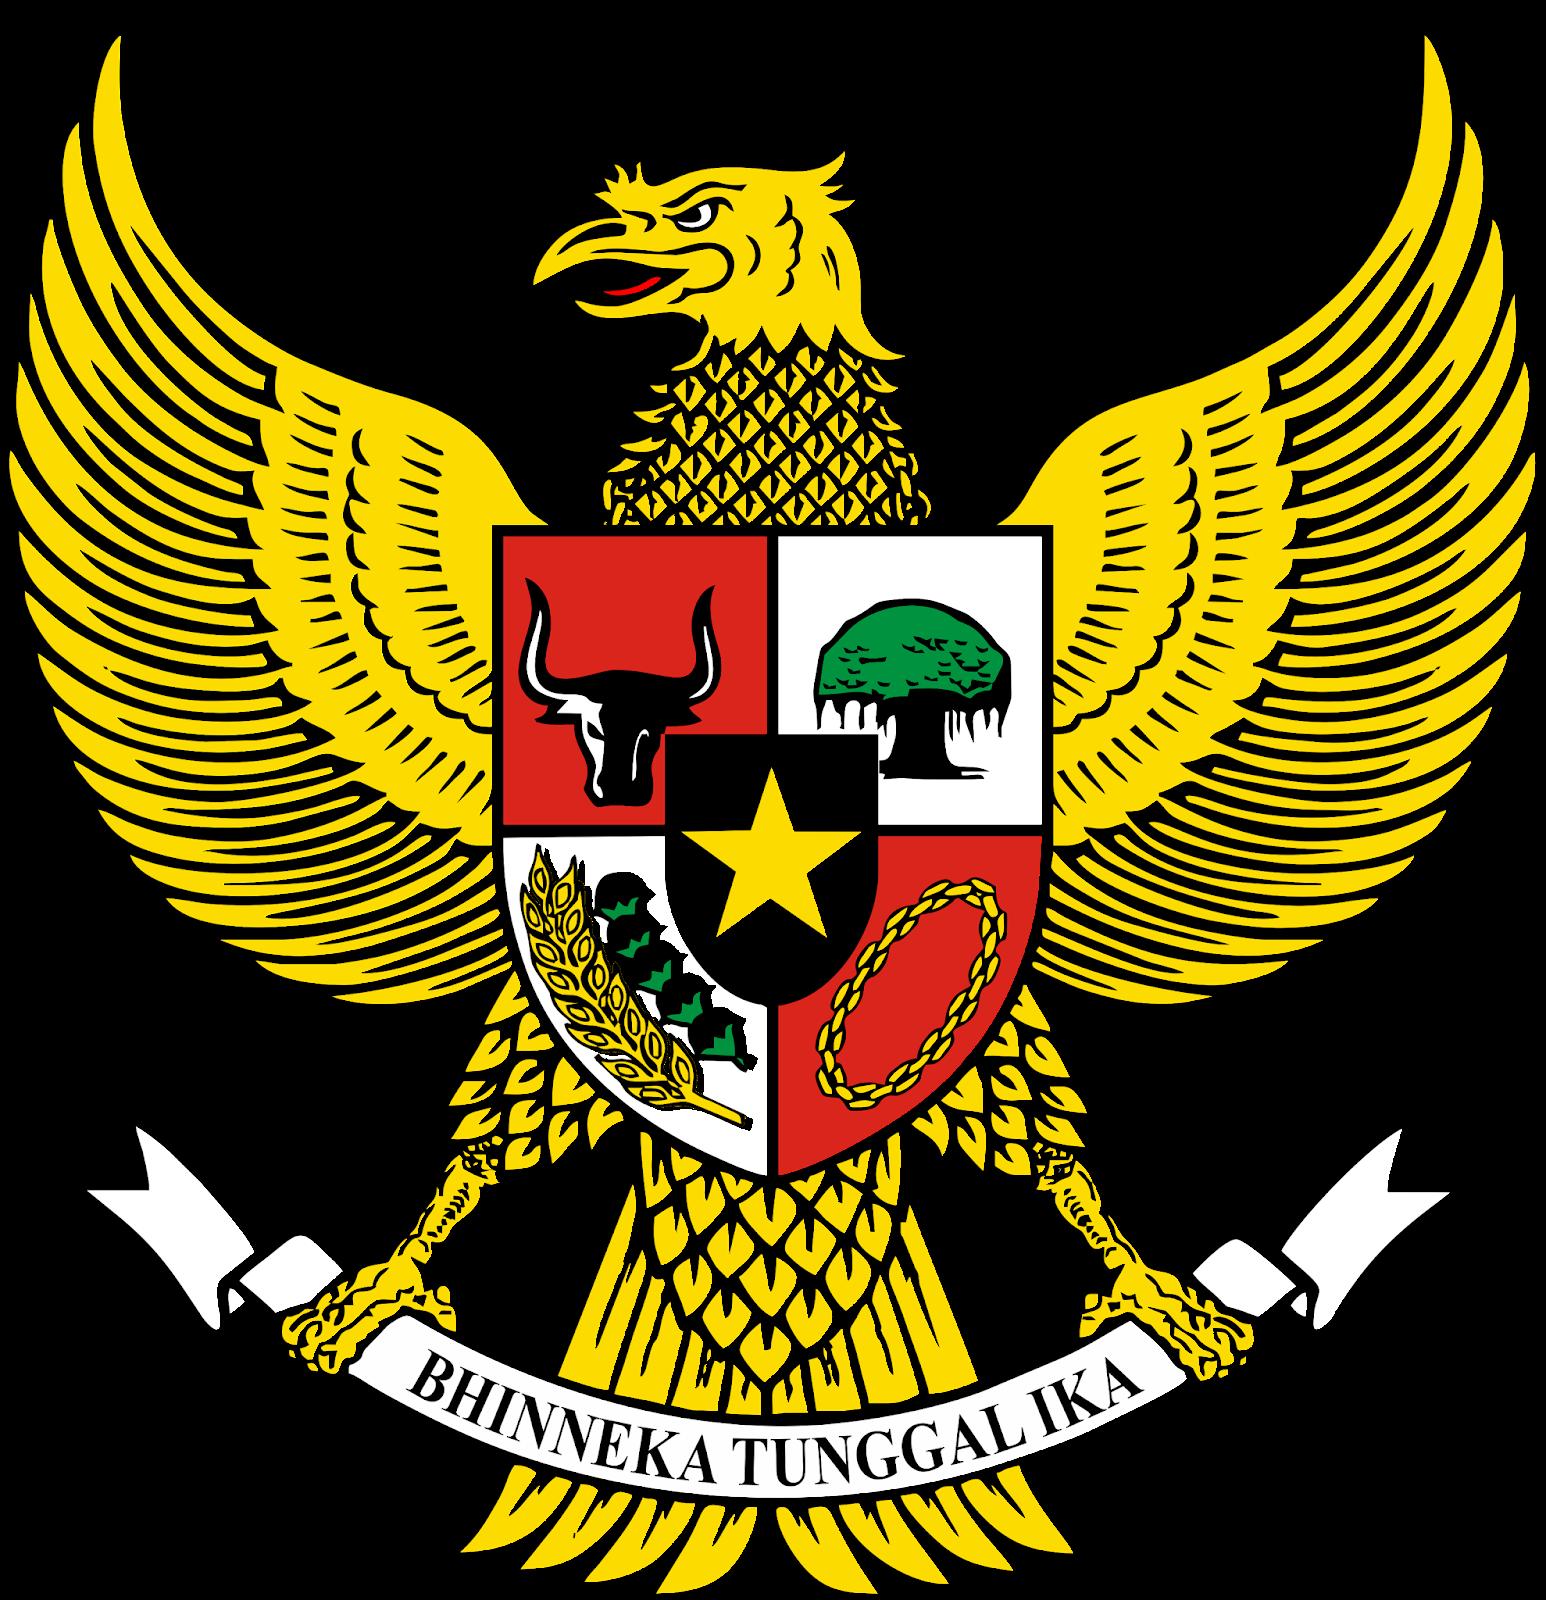 Garuda Pancasila Png Transparent Background Free Download 48975 Freeiconspng